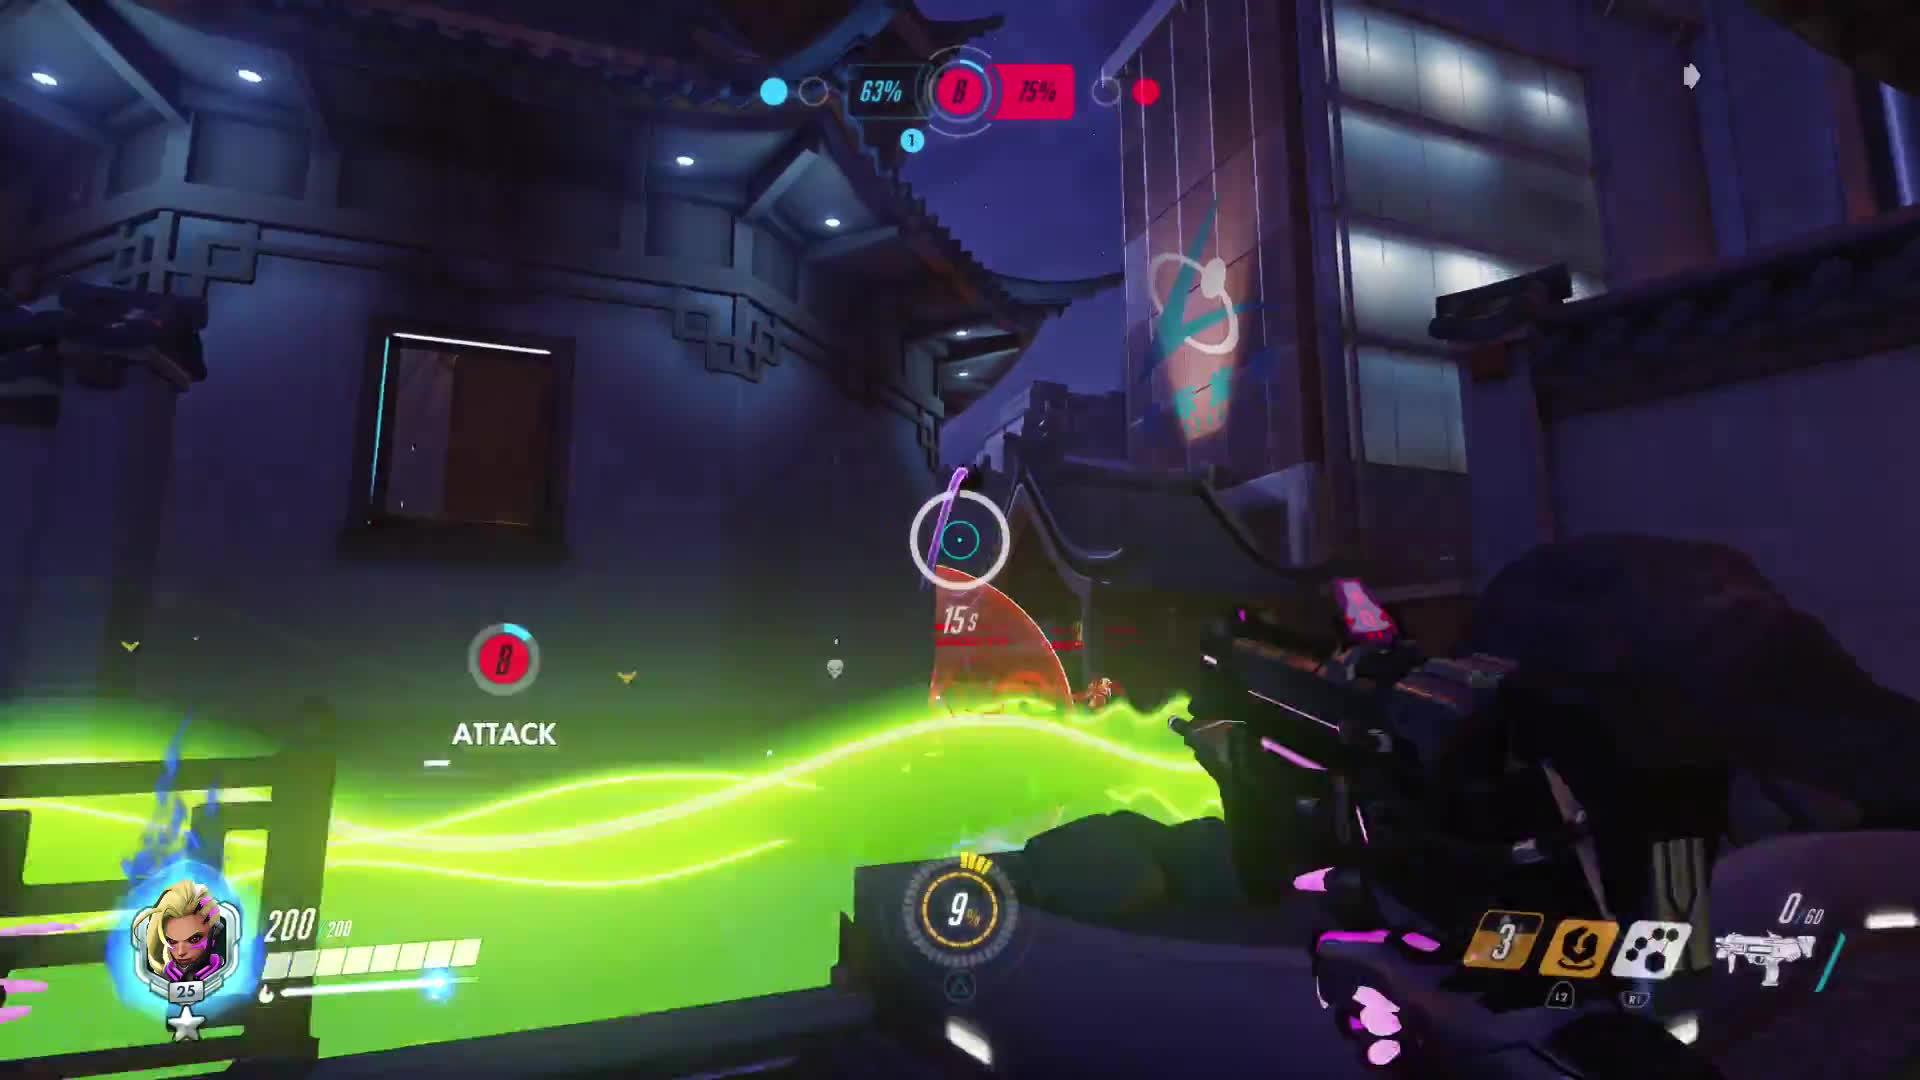 aggressive, overwatch, sombra, Sombra is Bad? - Sombra - Overwatch GIFs